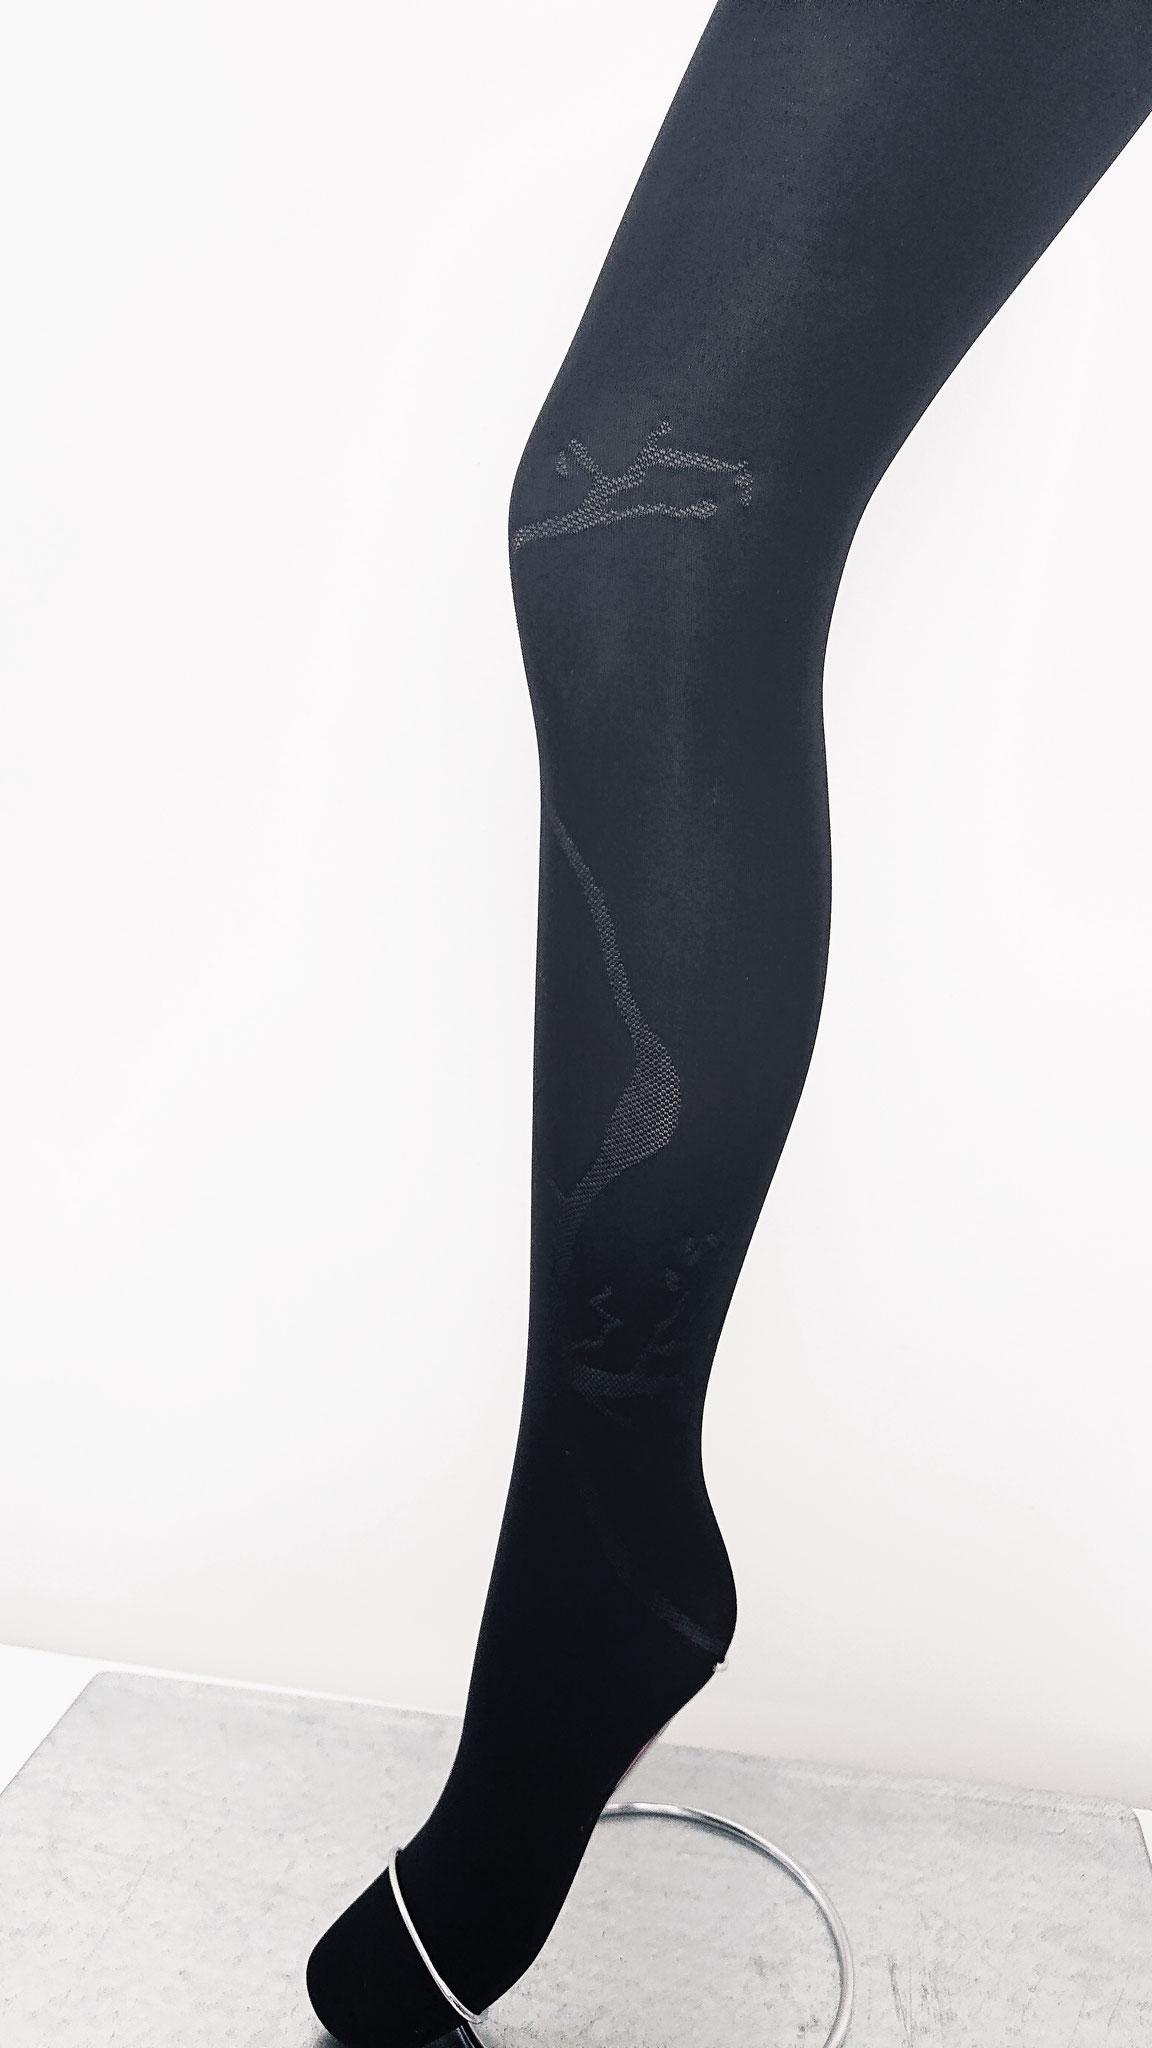 Strumpfhosen Uni mit transparentem Muster 40 DEN  (CHF 47.-)